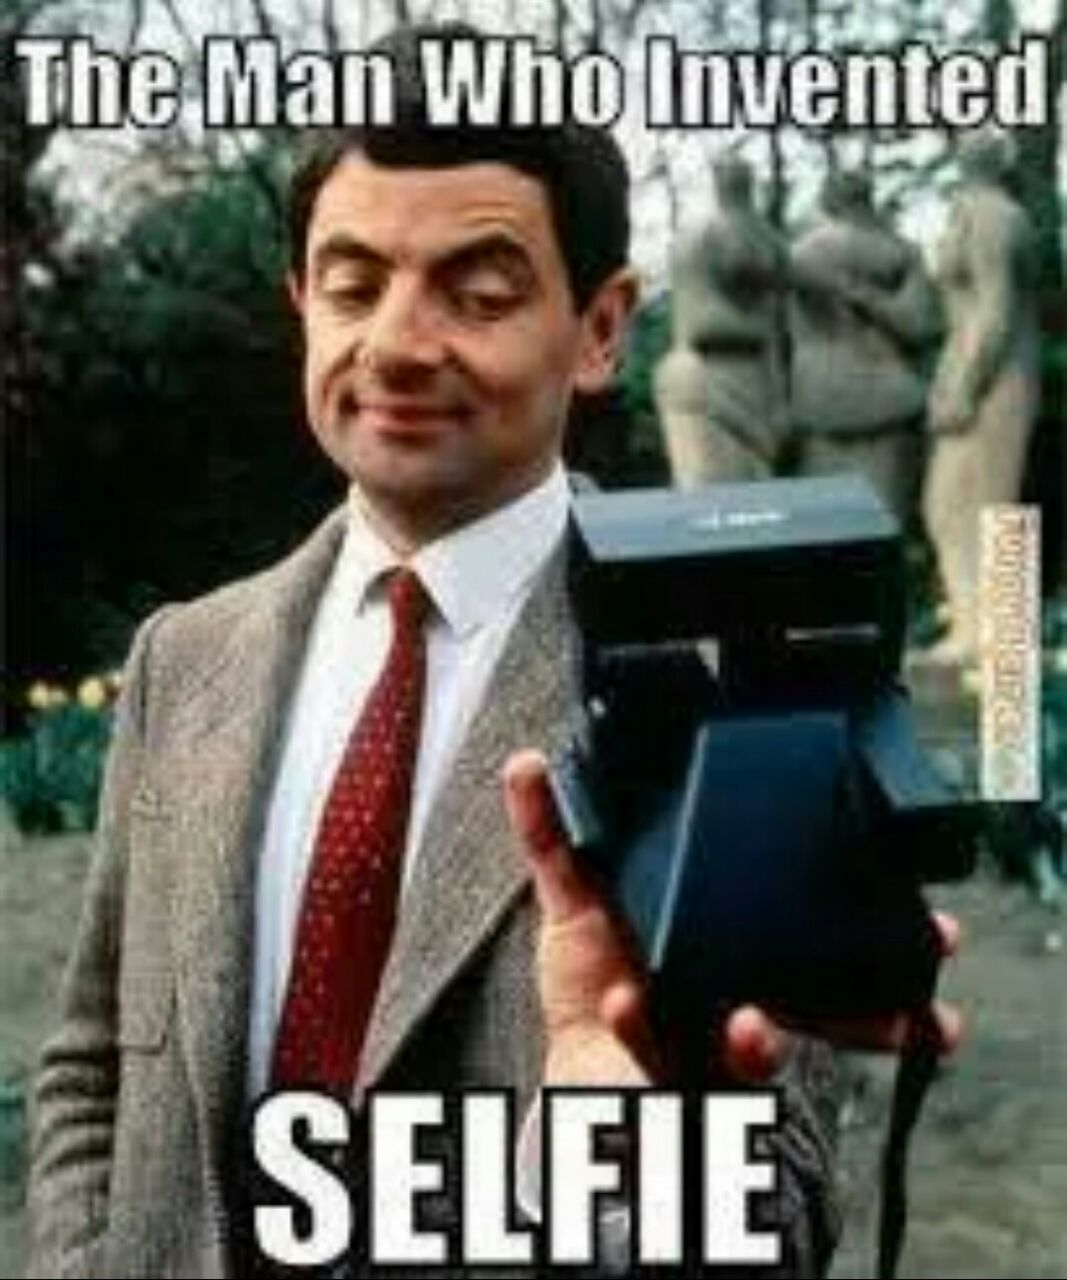 Inventor of the selfie